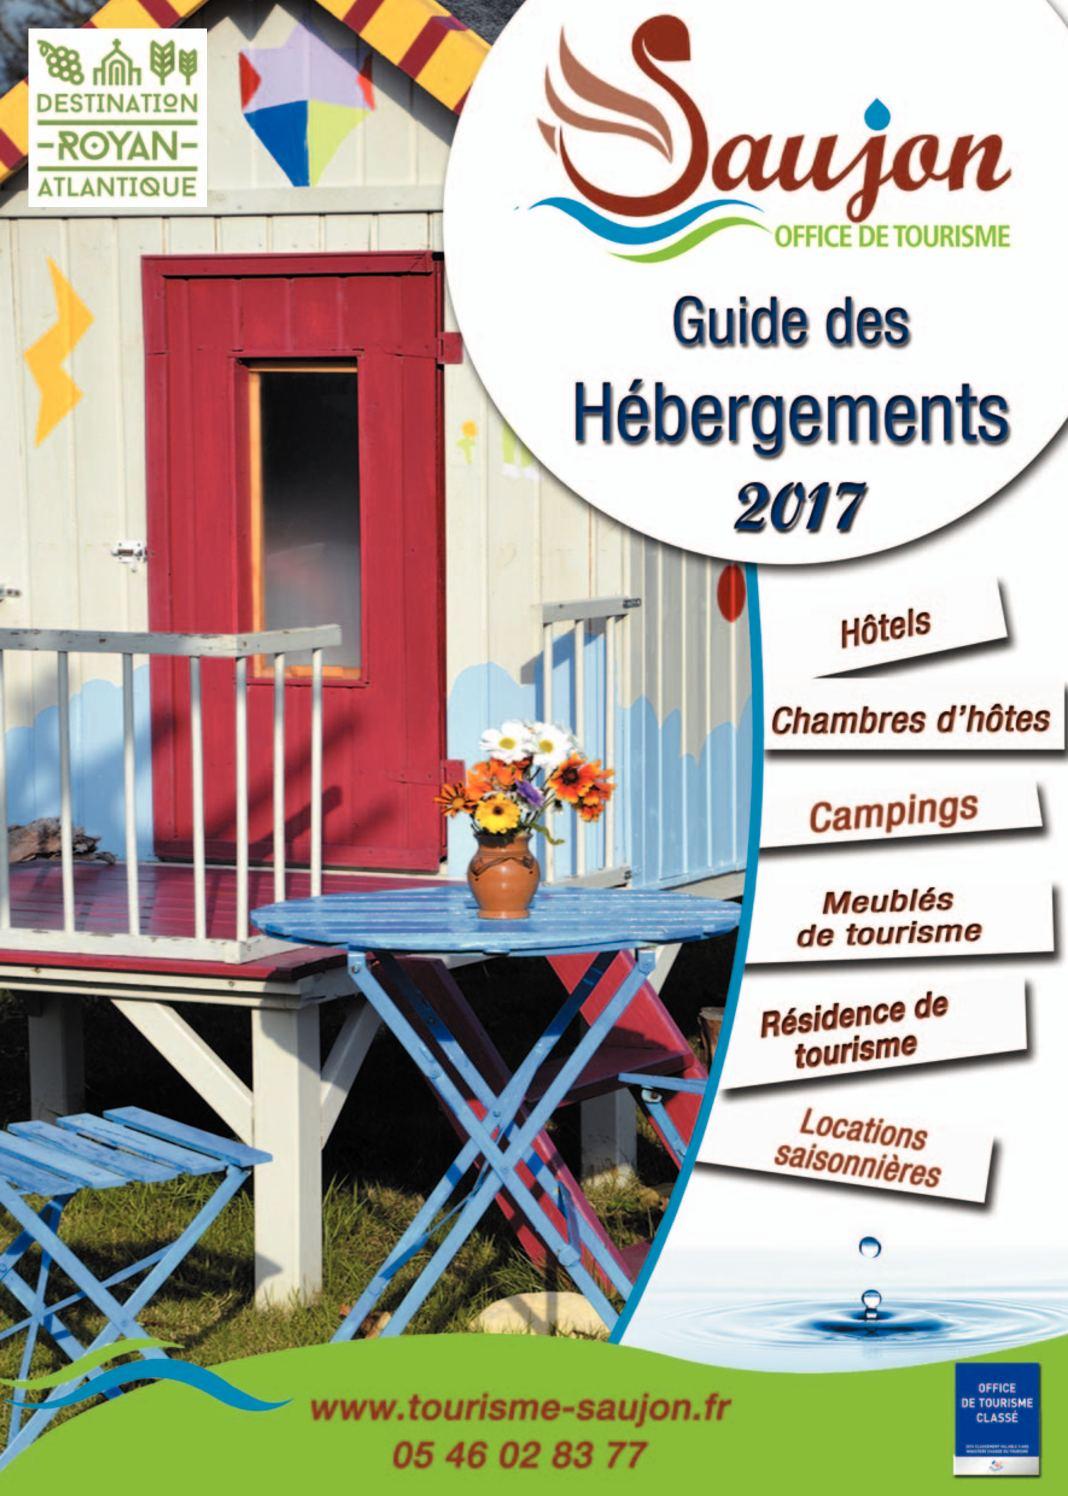 Calam o guide h bergement saujon 2017 - Office de tourisme saujon ...